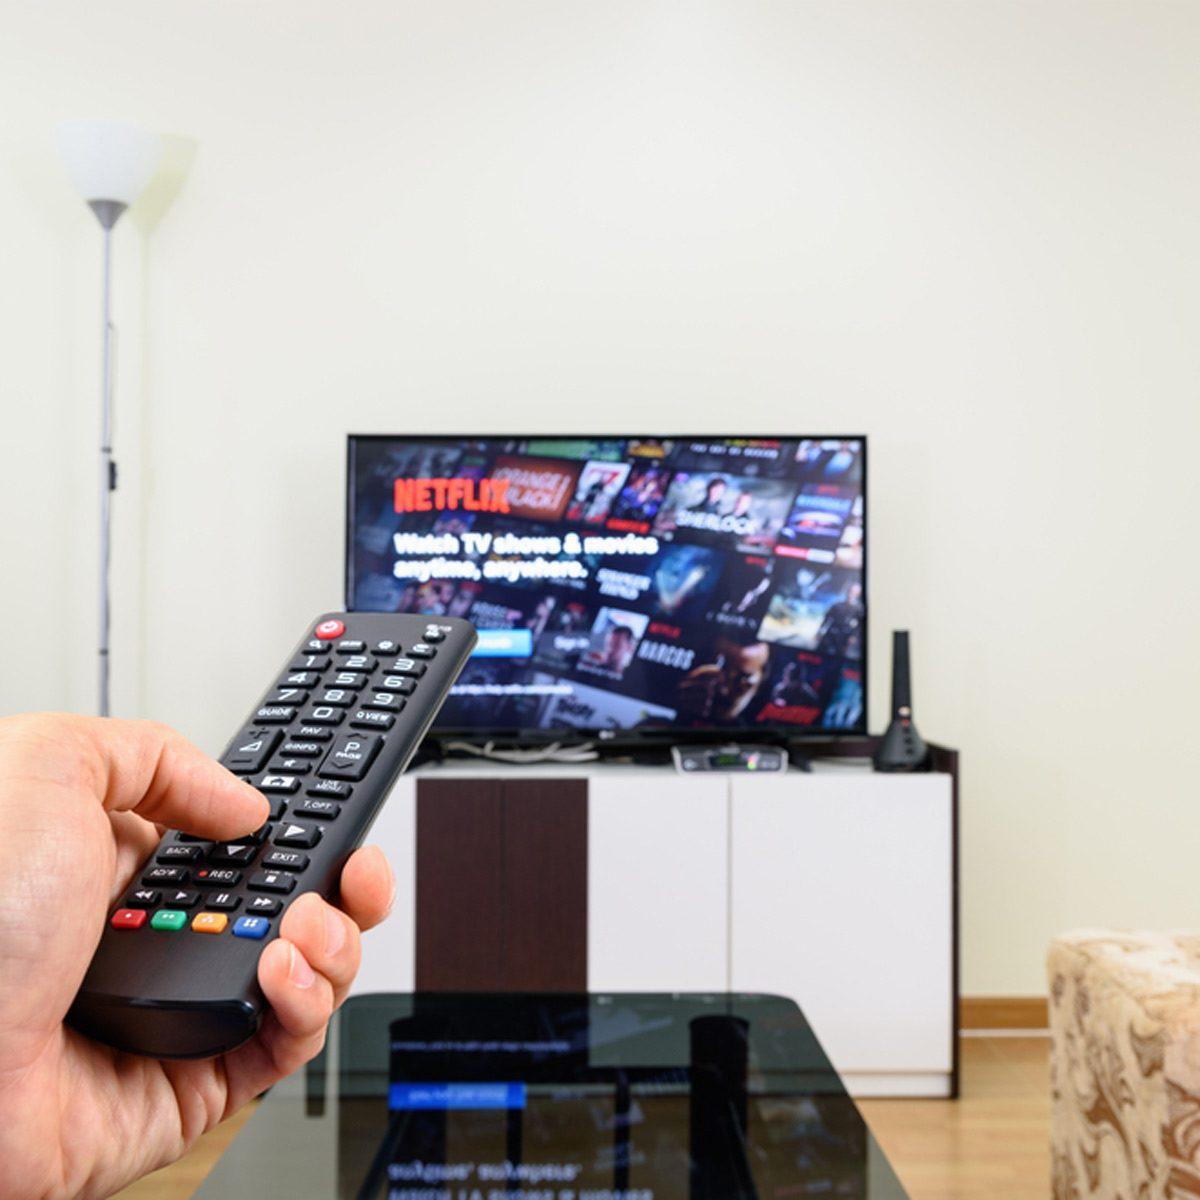 dfh28_shutterstock_611188976 streaming stick remote smart tv netflix